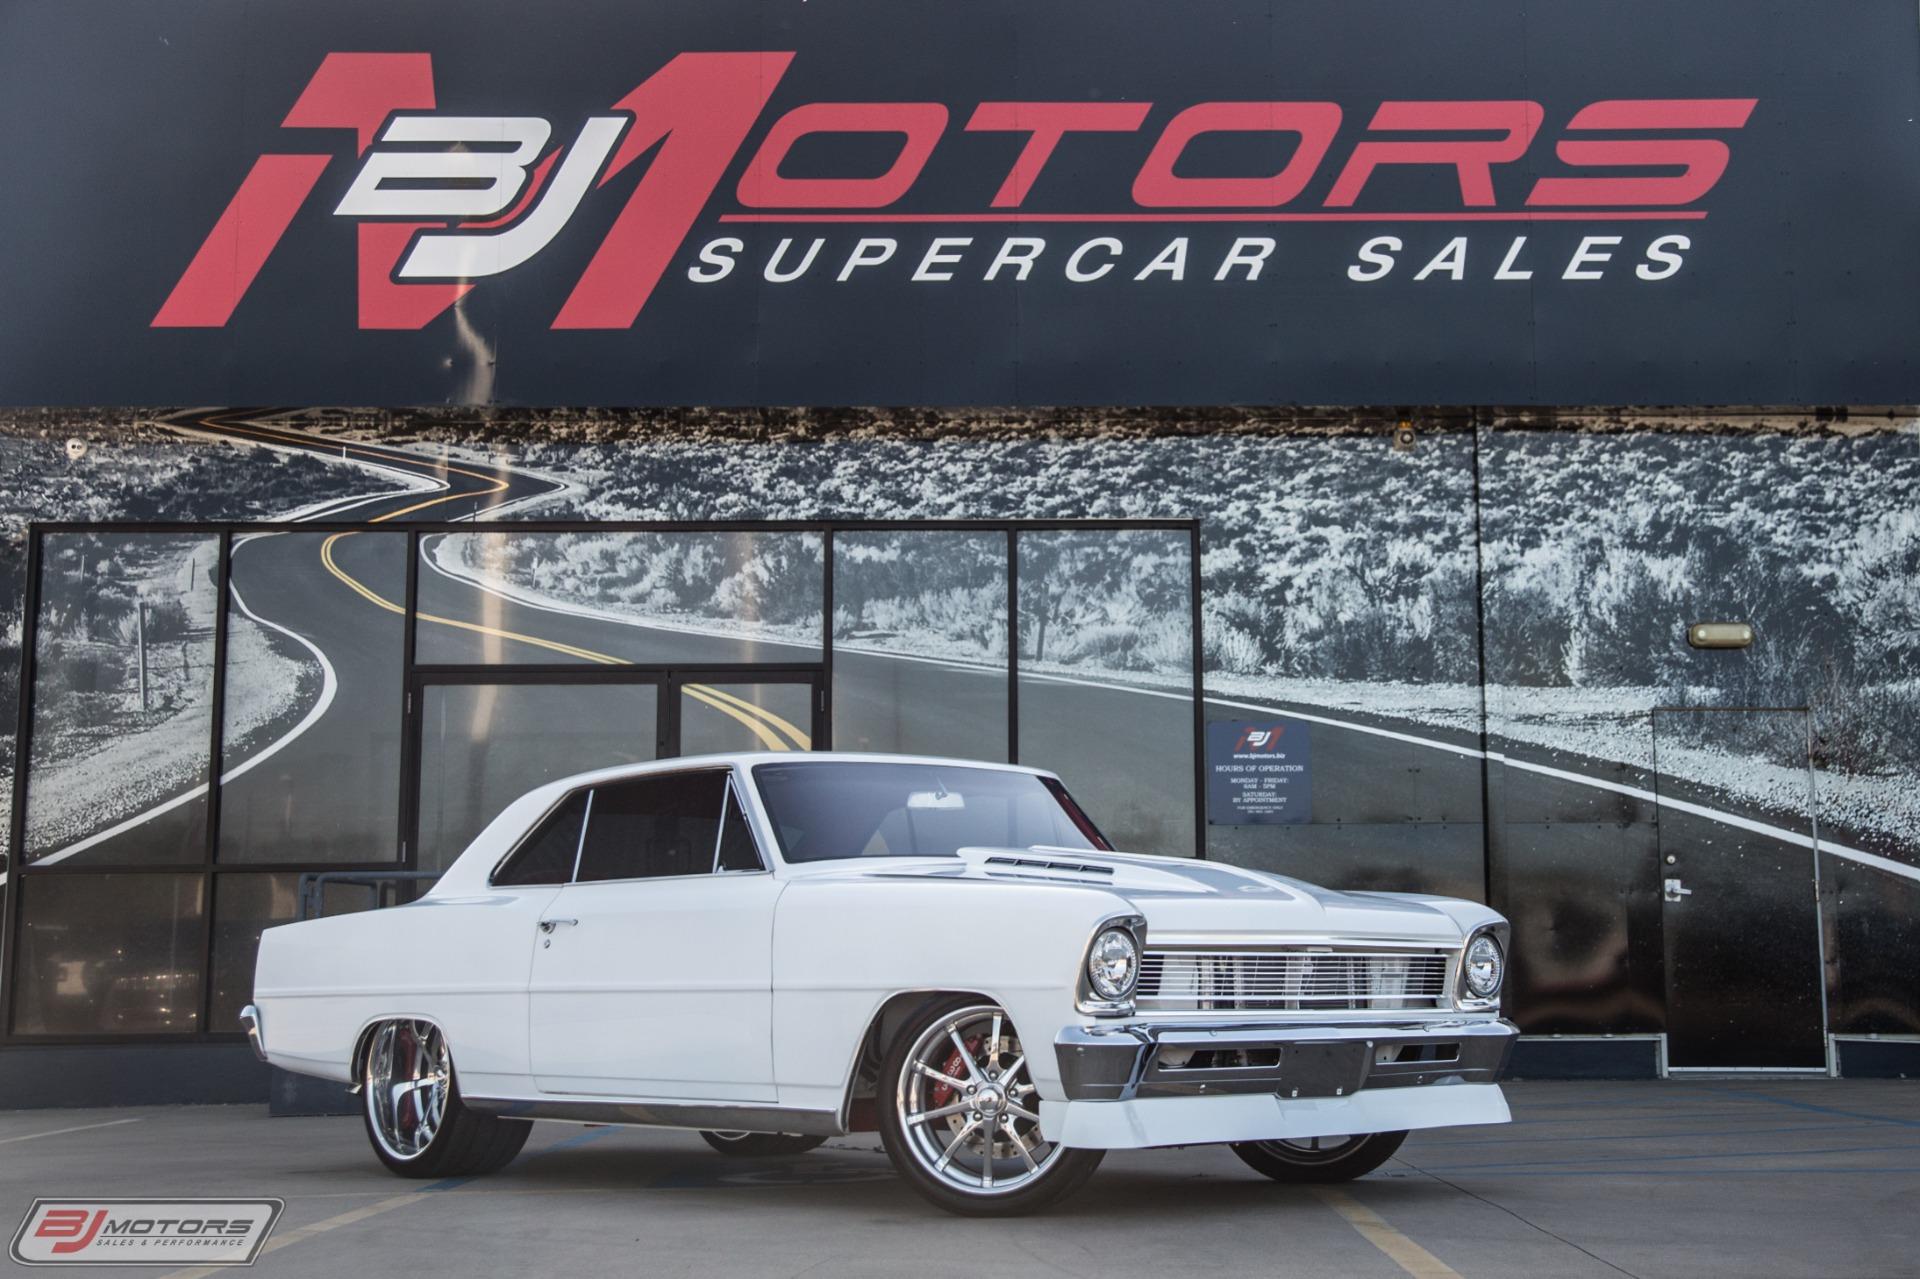 Used-1966-Chevrolet-Nova